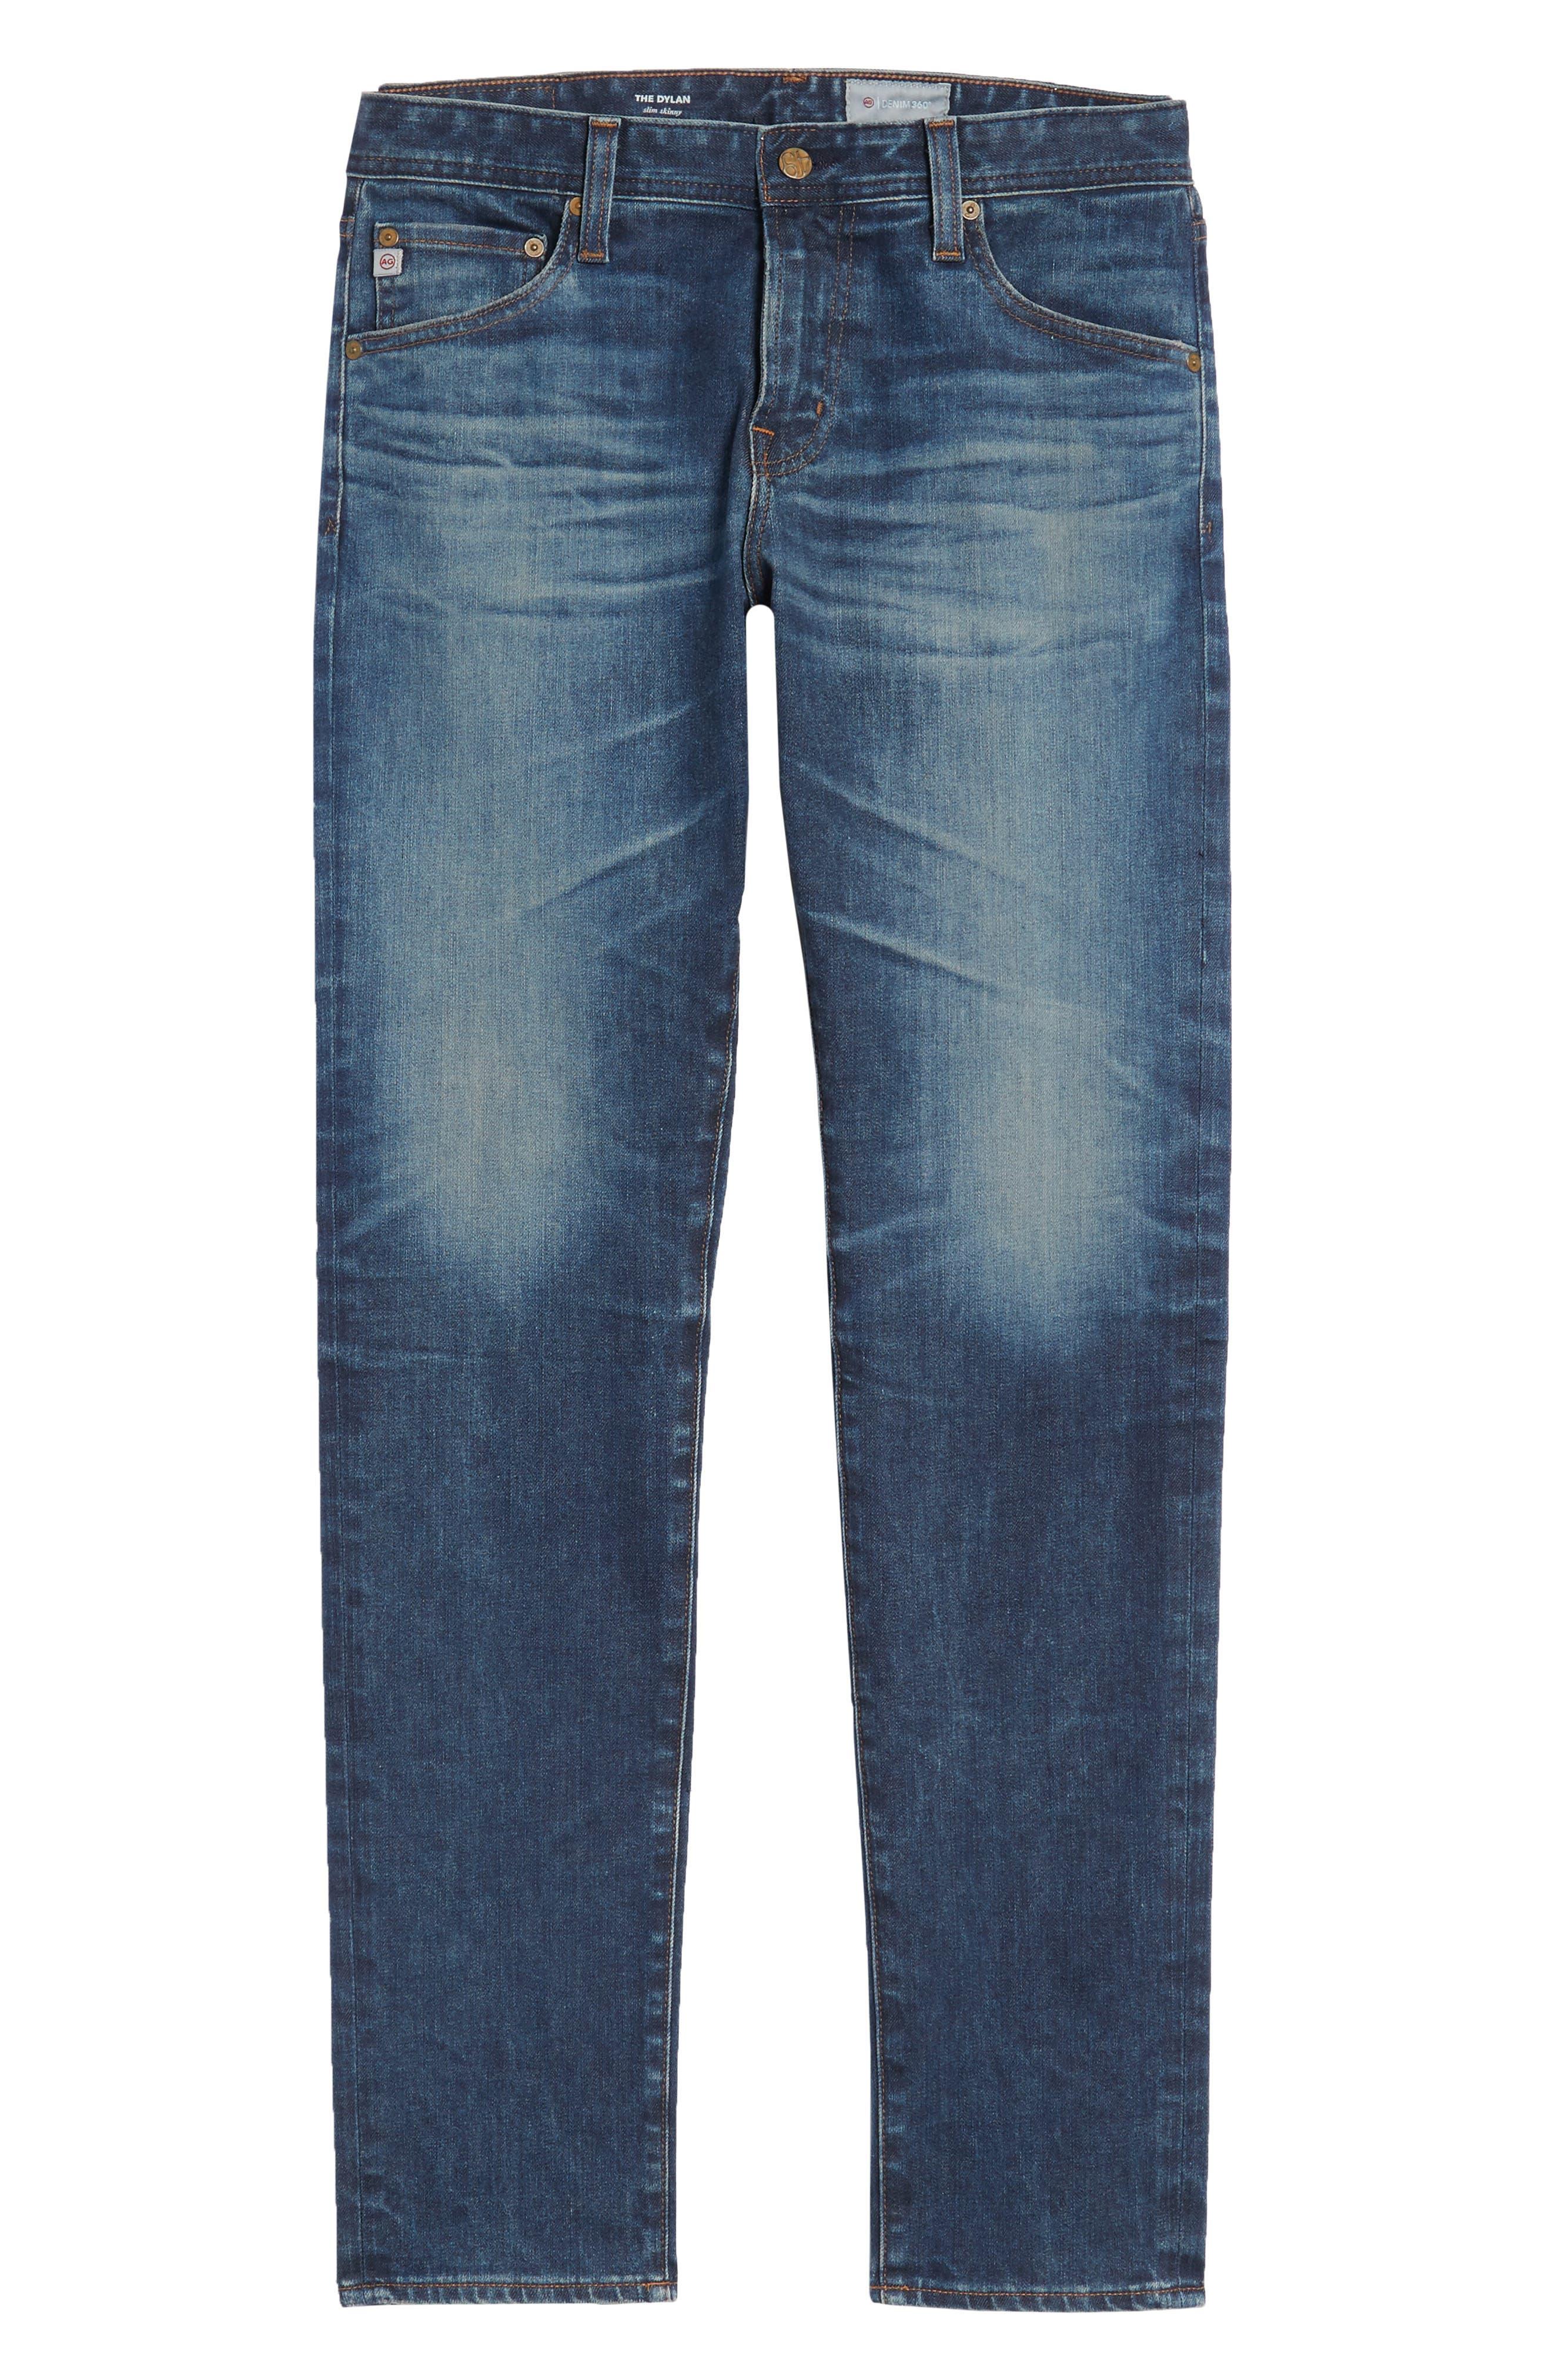 Dylan Slim Skinny Fit Jeans,                             Alternate thumbnail 6, color,                             12 Years River Veil